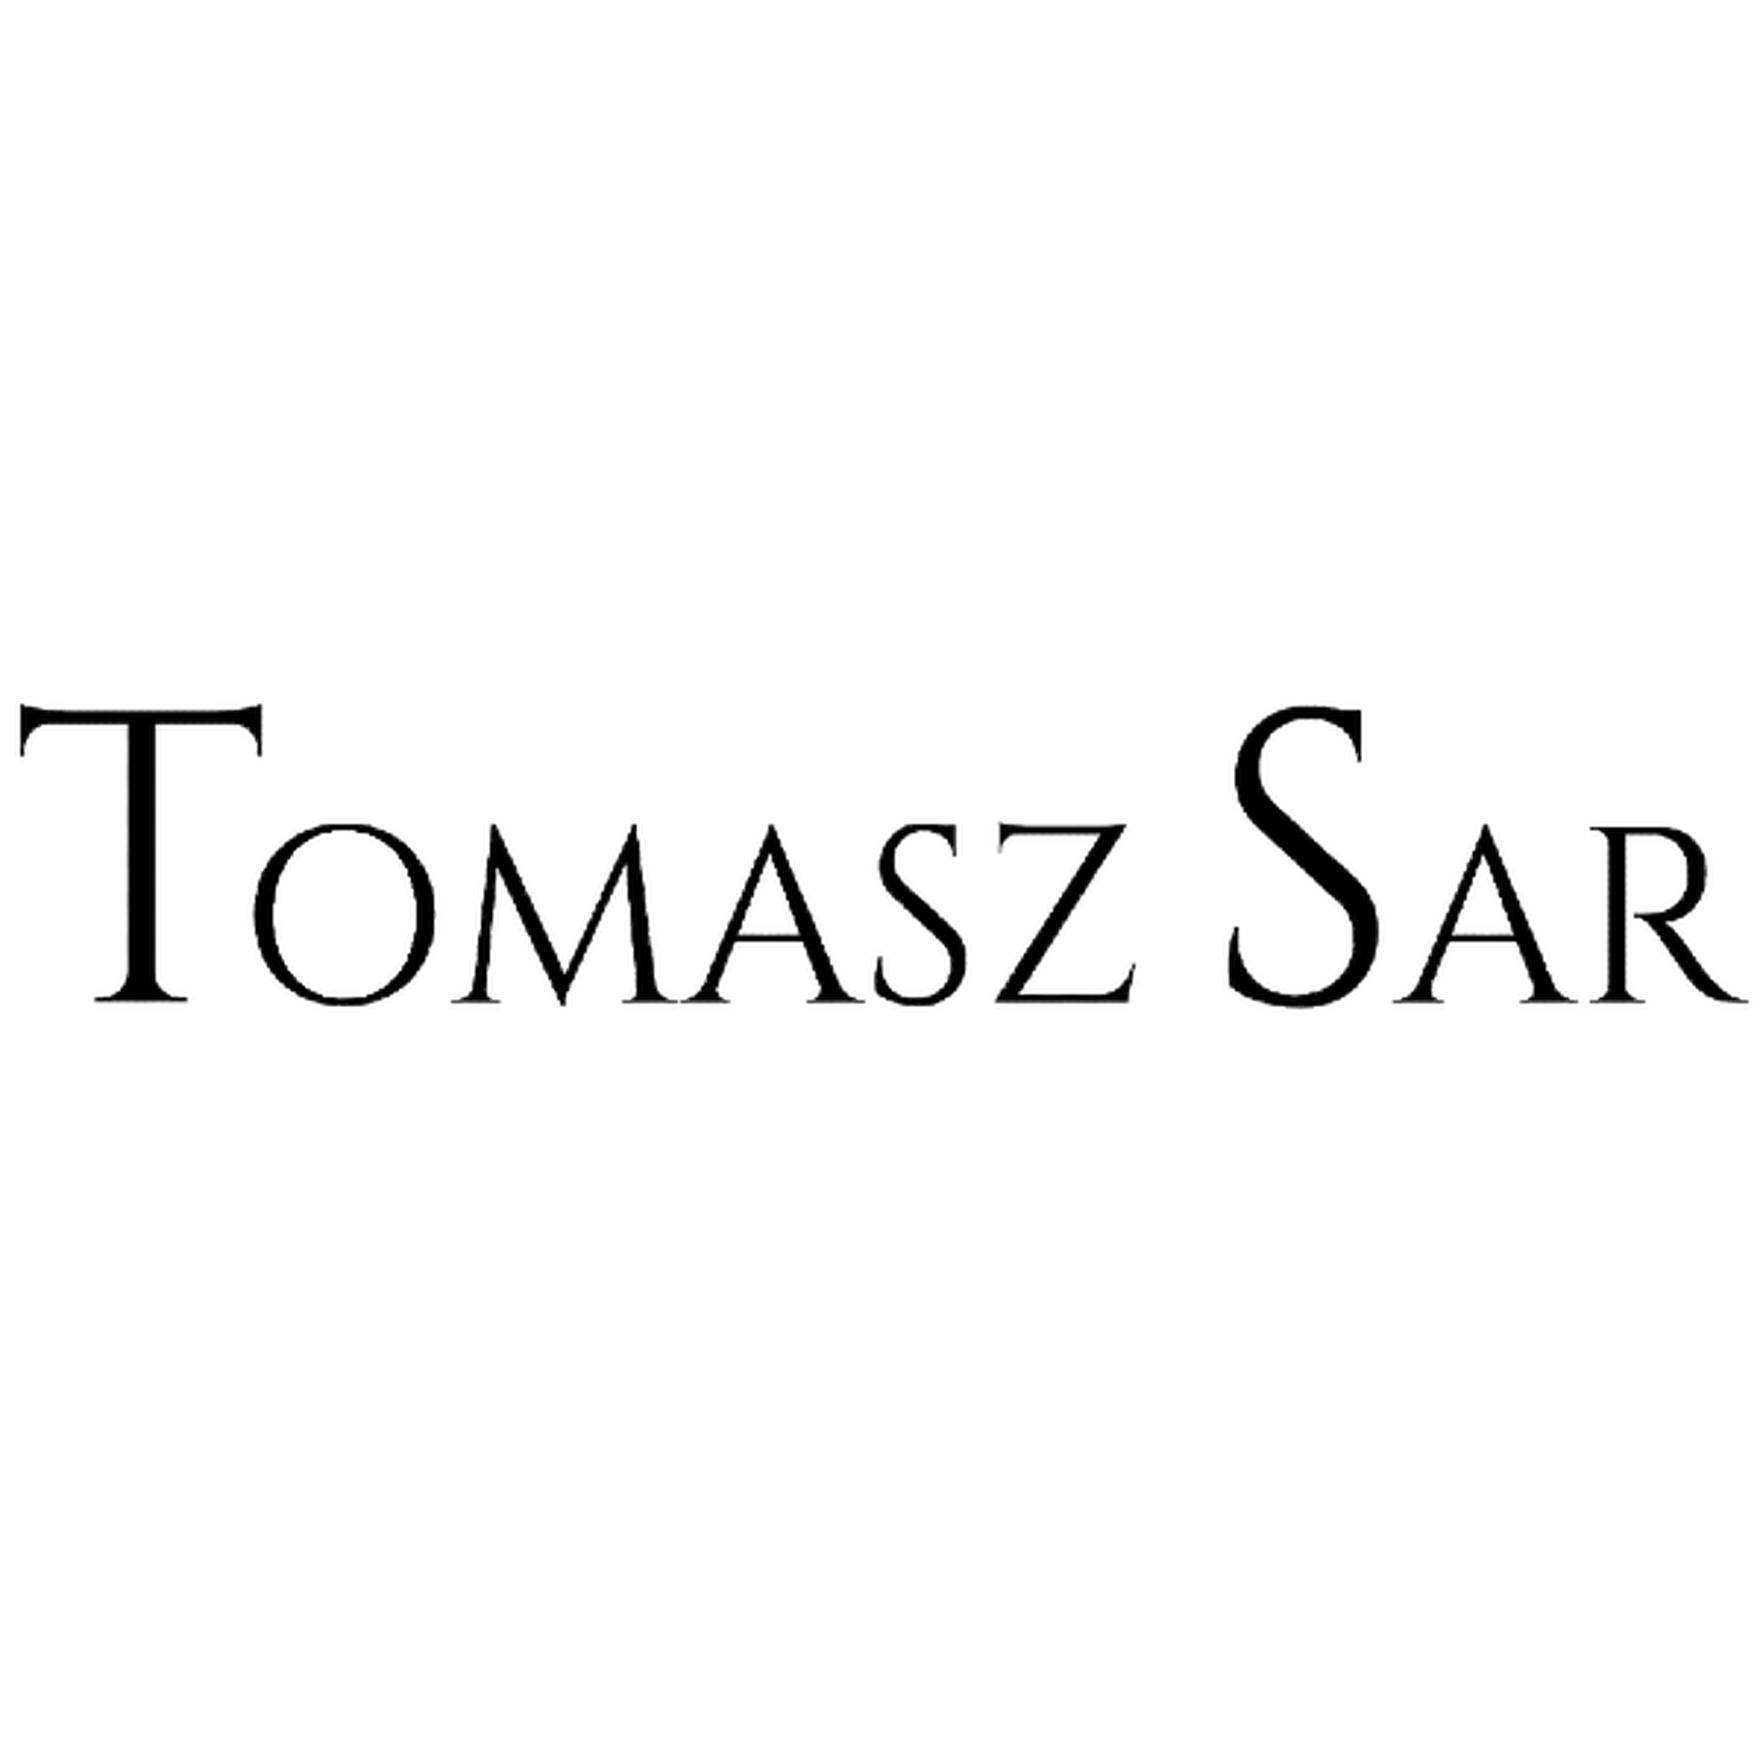 Tomaszsar.pl